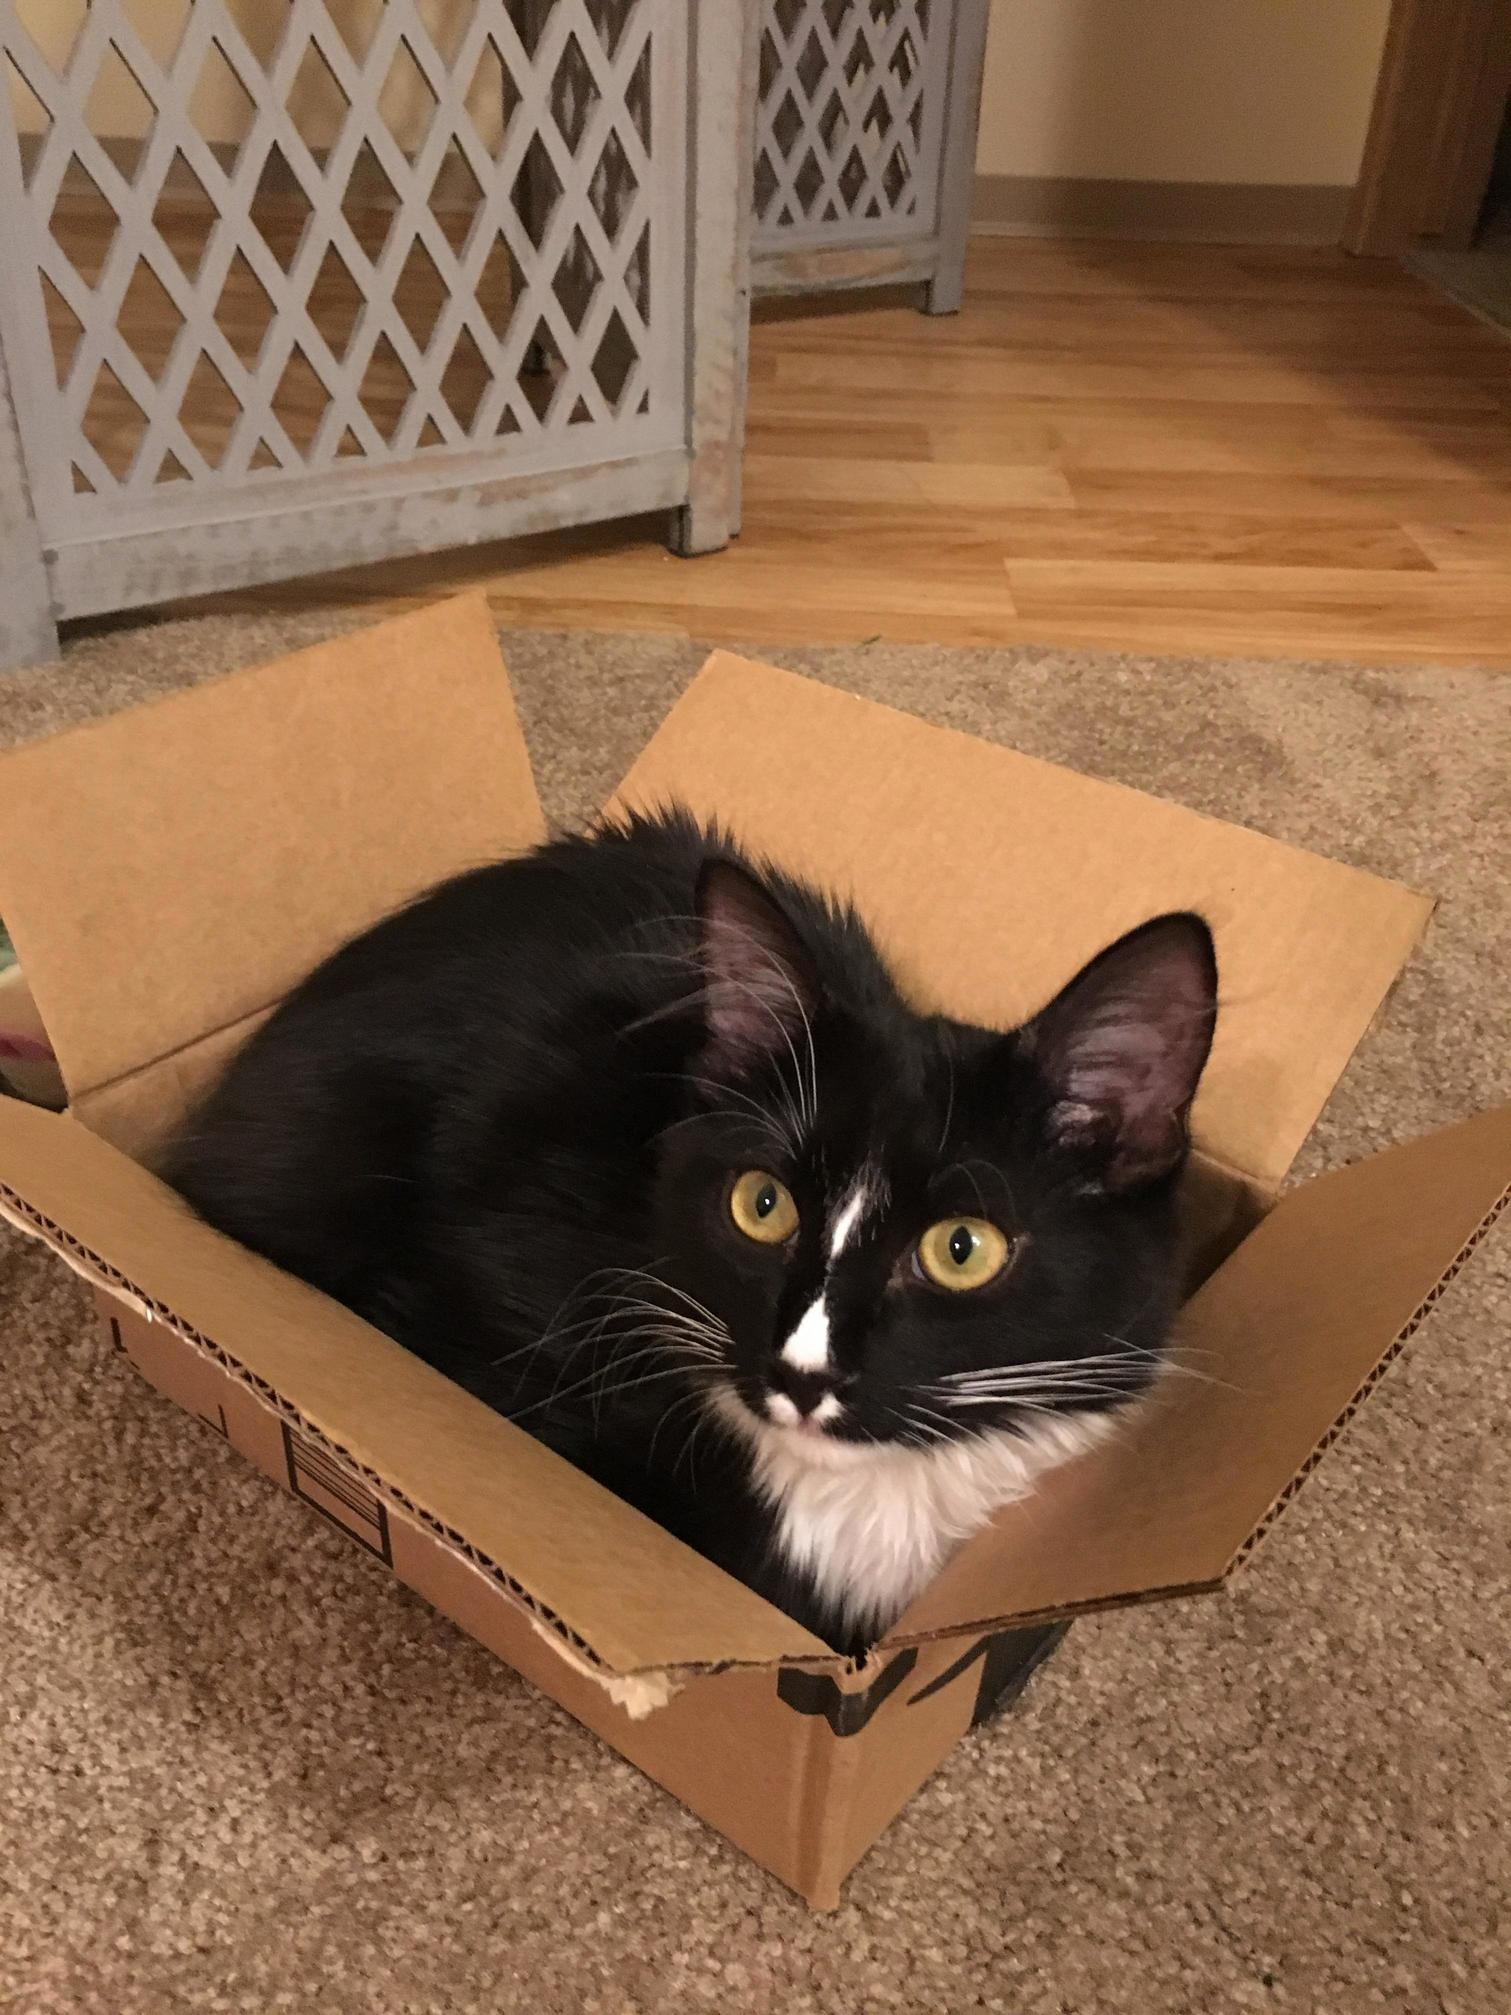 If he fits, he sits